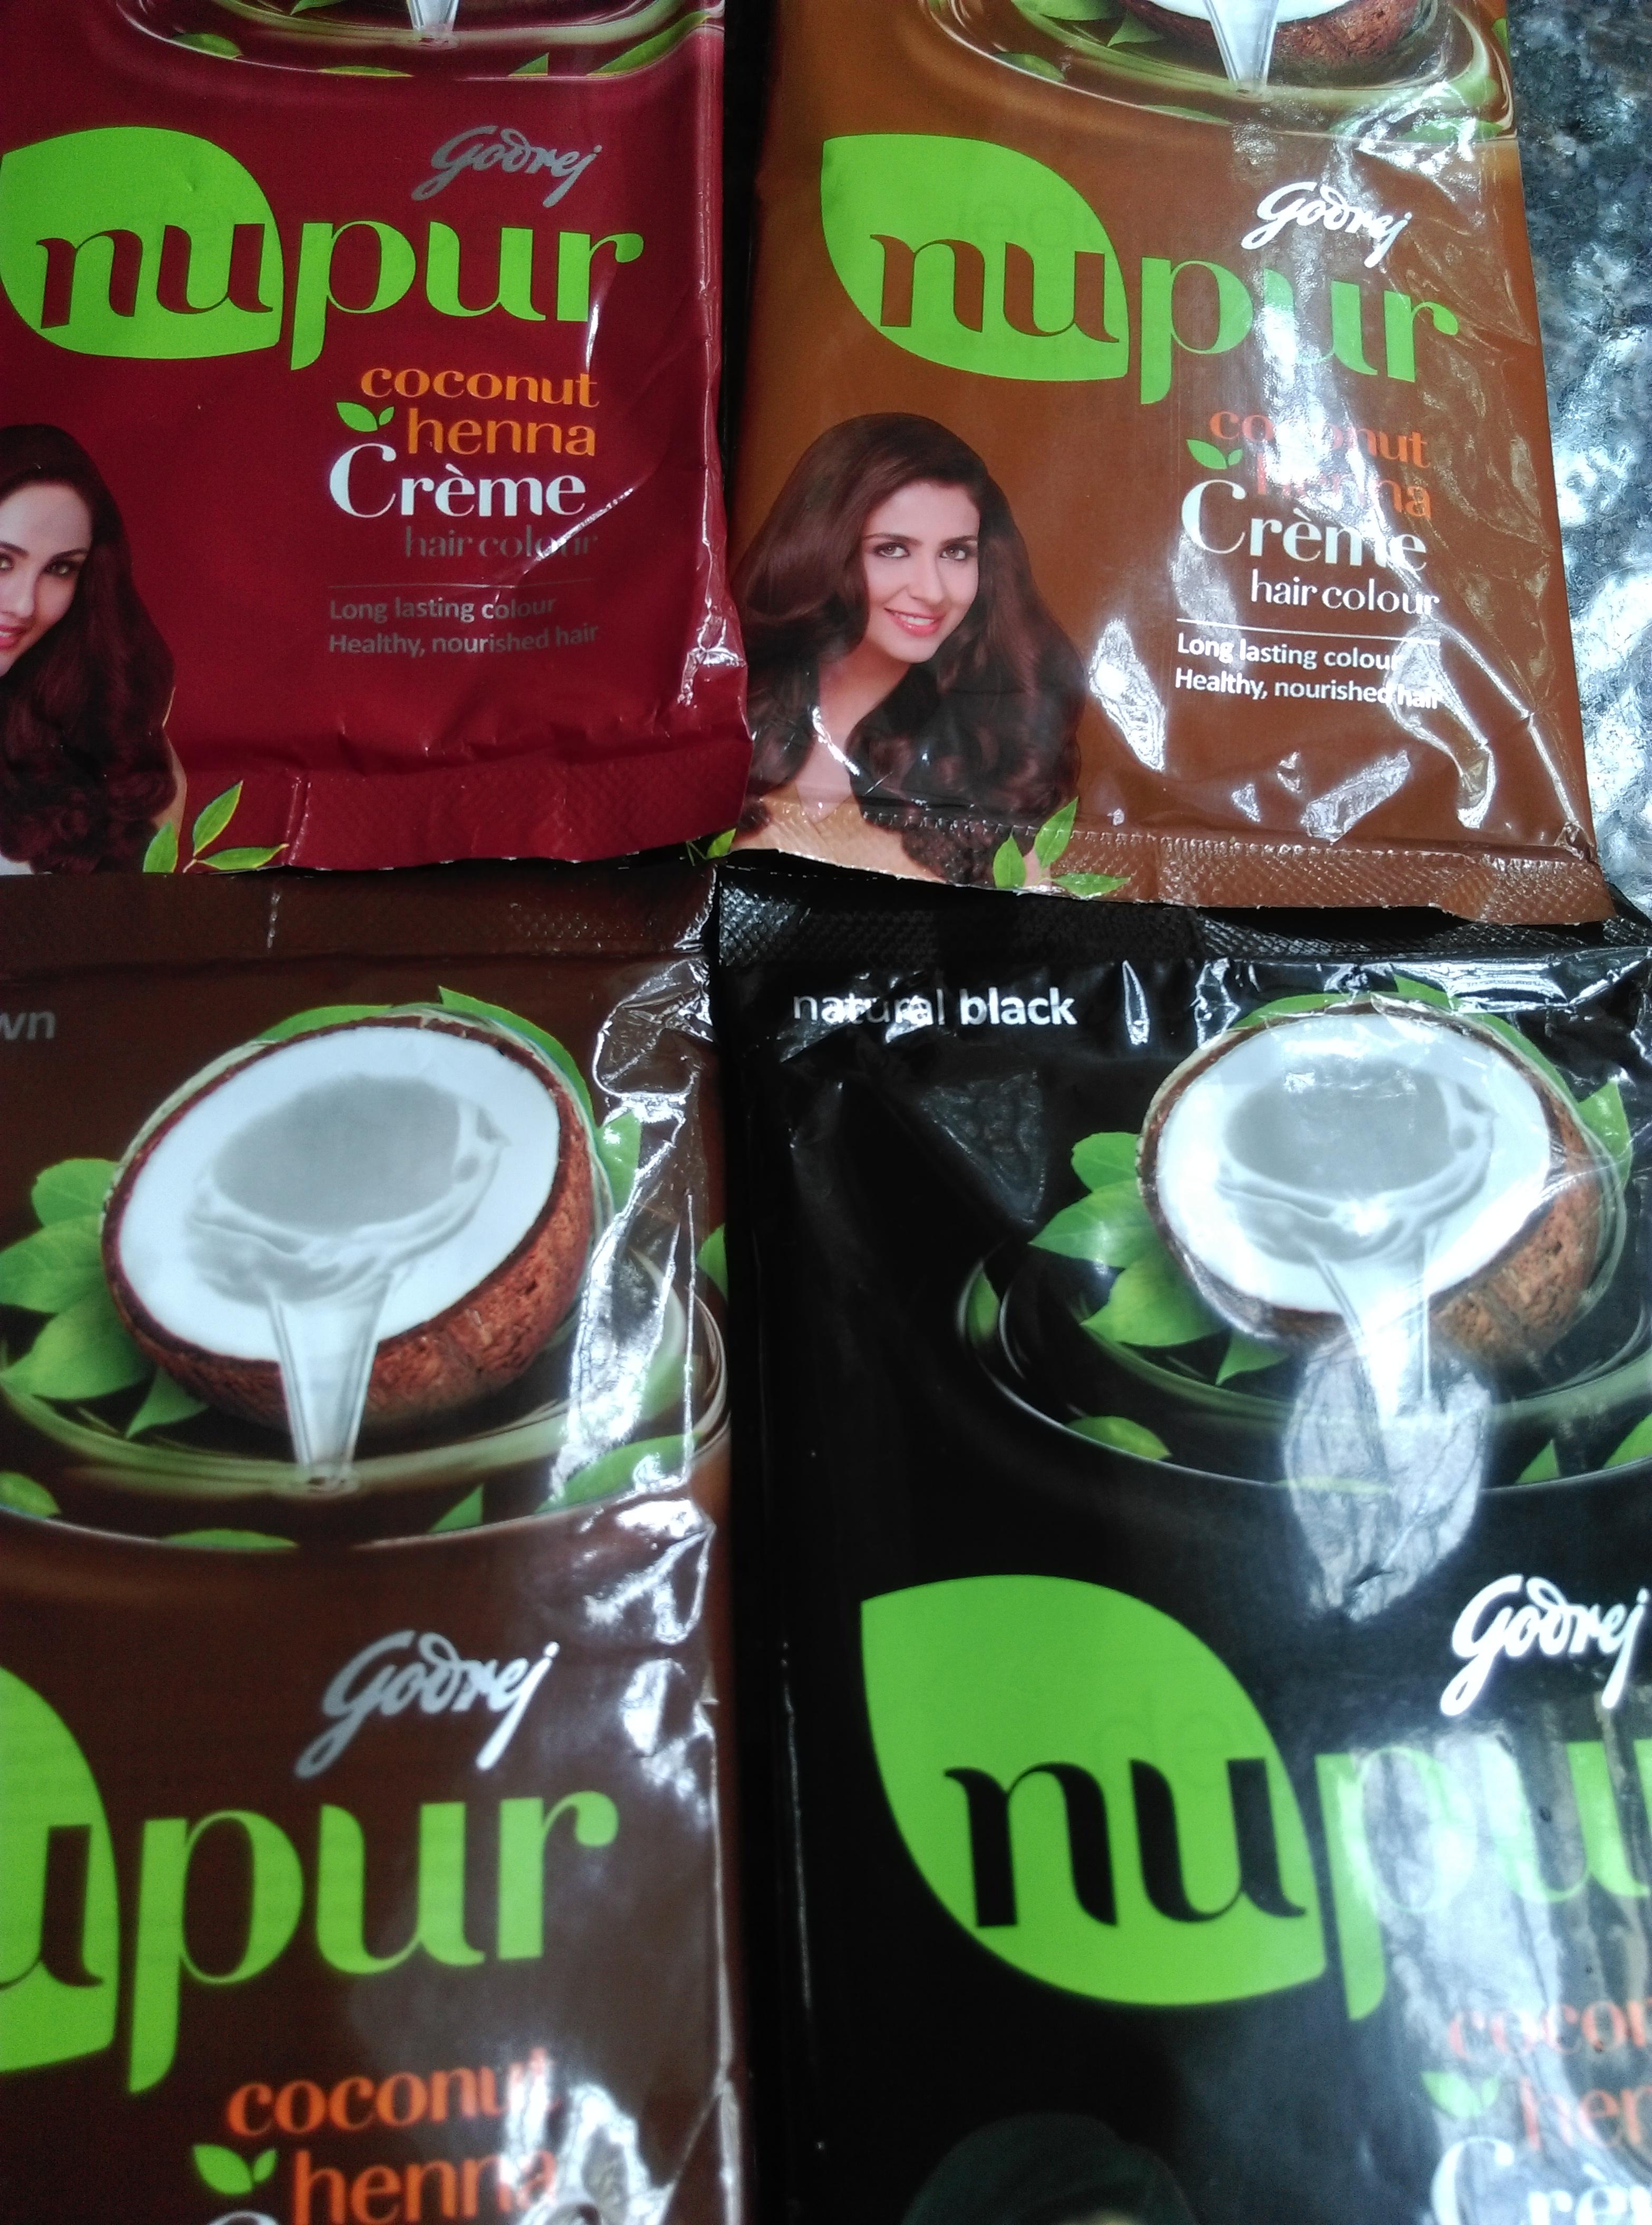 New Godrej Nupur Coconut Henna Creme Sweetannu